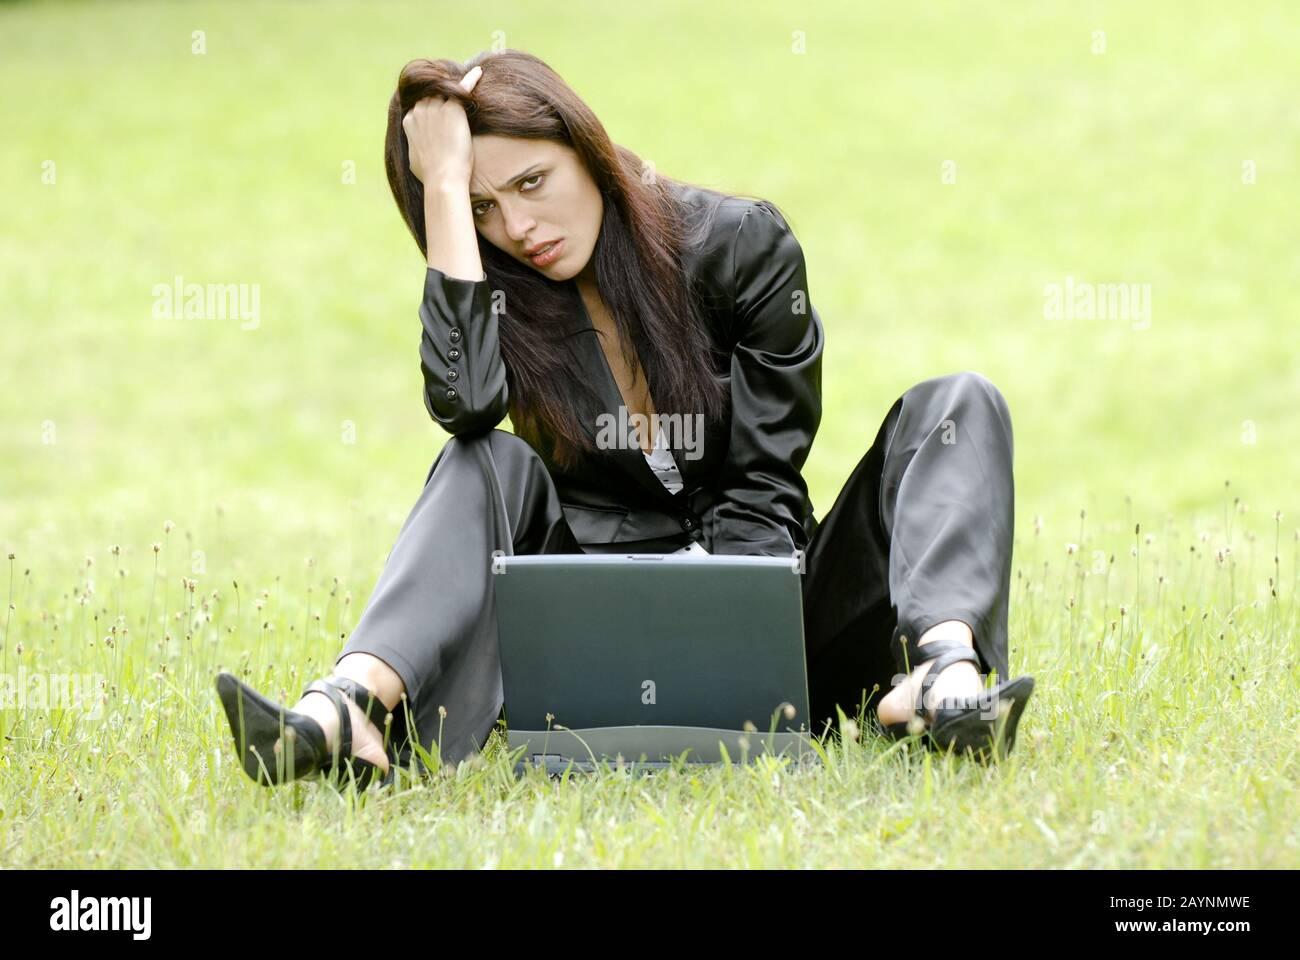 Junge Frau ist verzweifelt Foto de stock